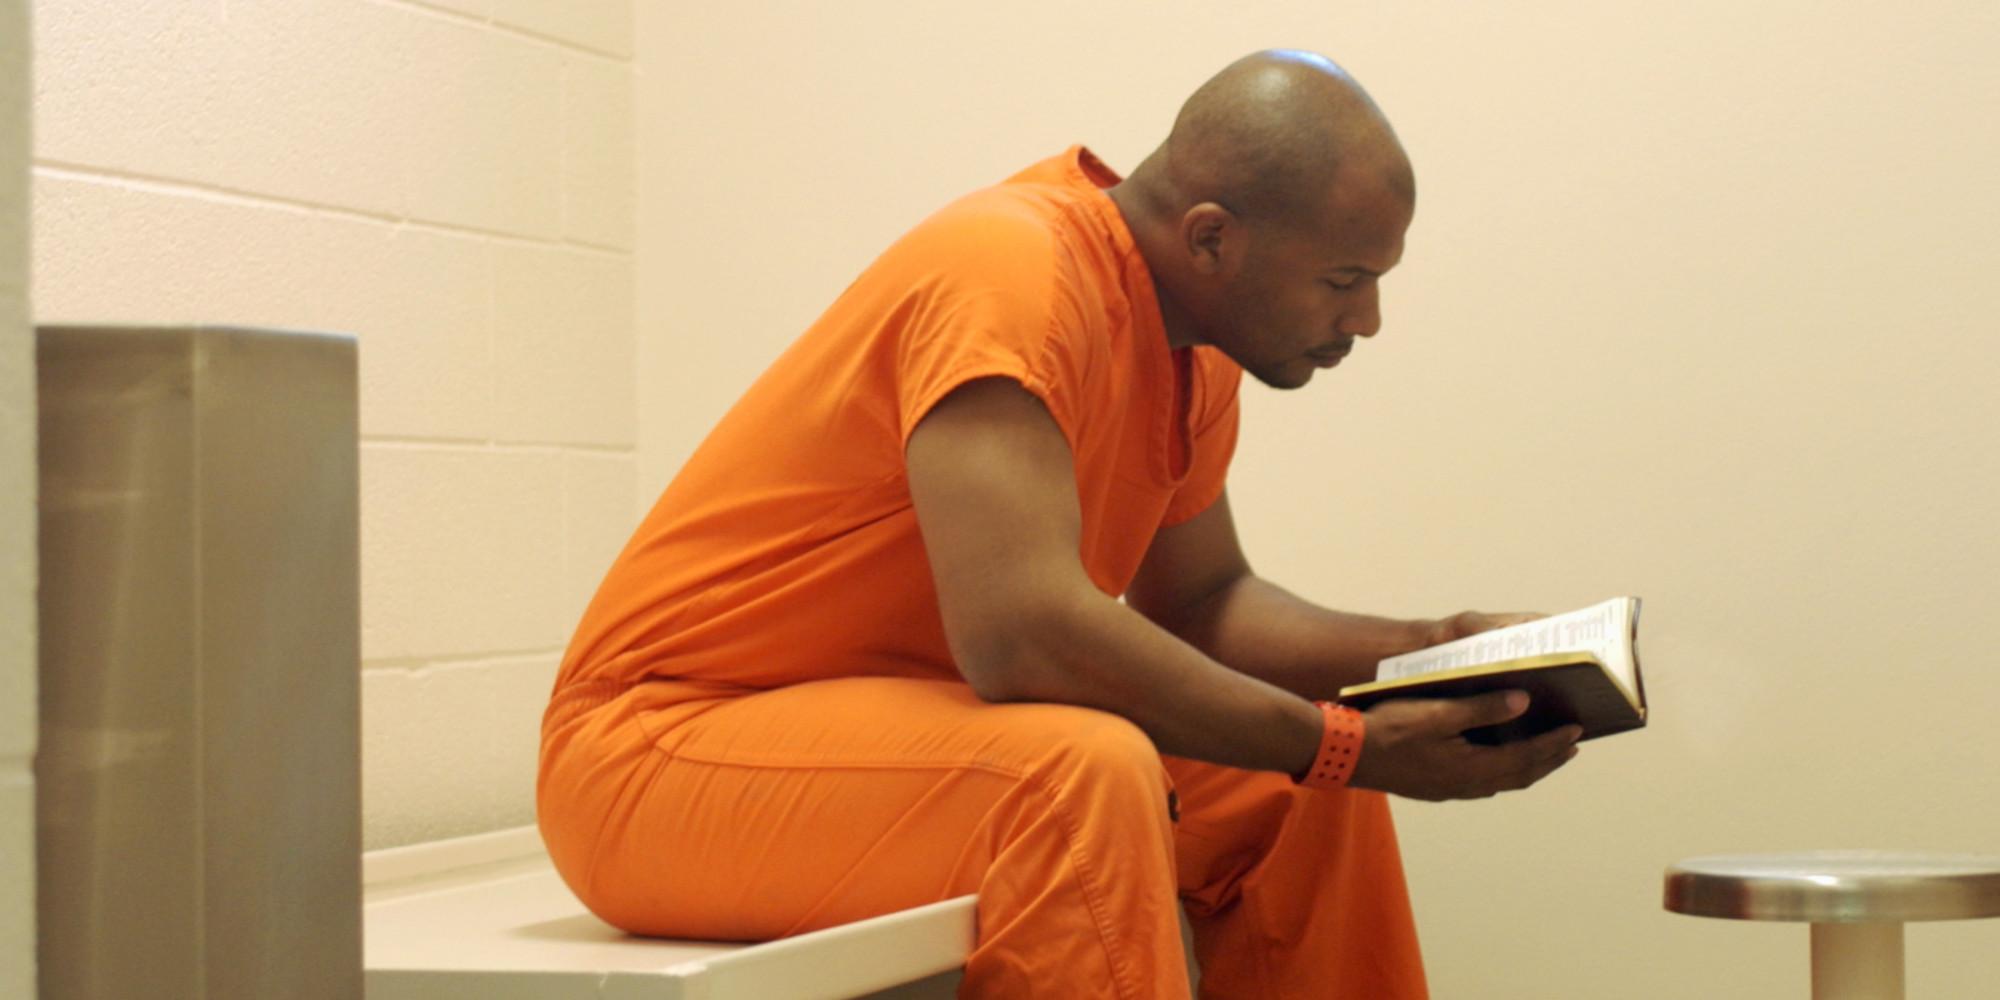 Bible Prisoner Programs | Correspondence Courses for